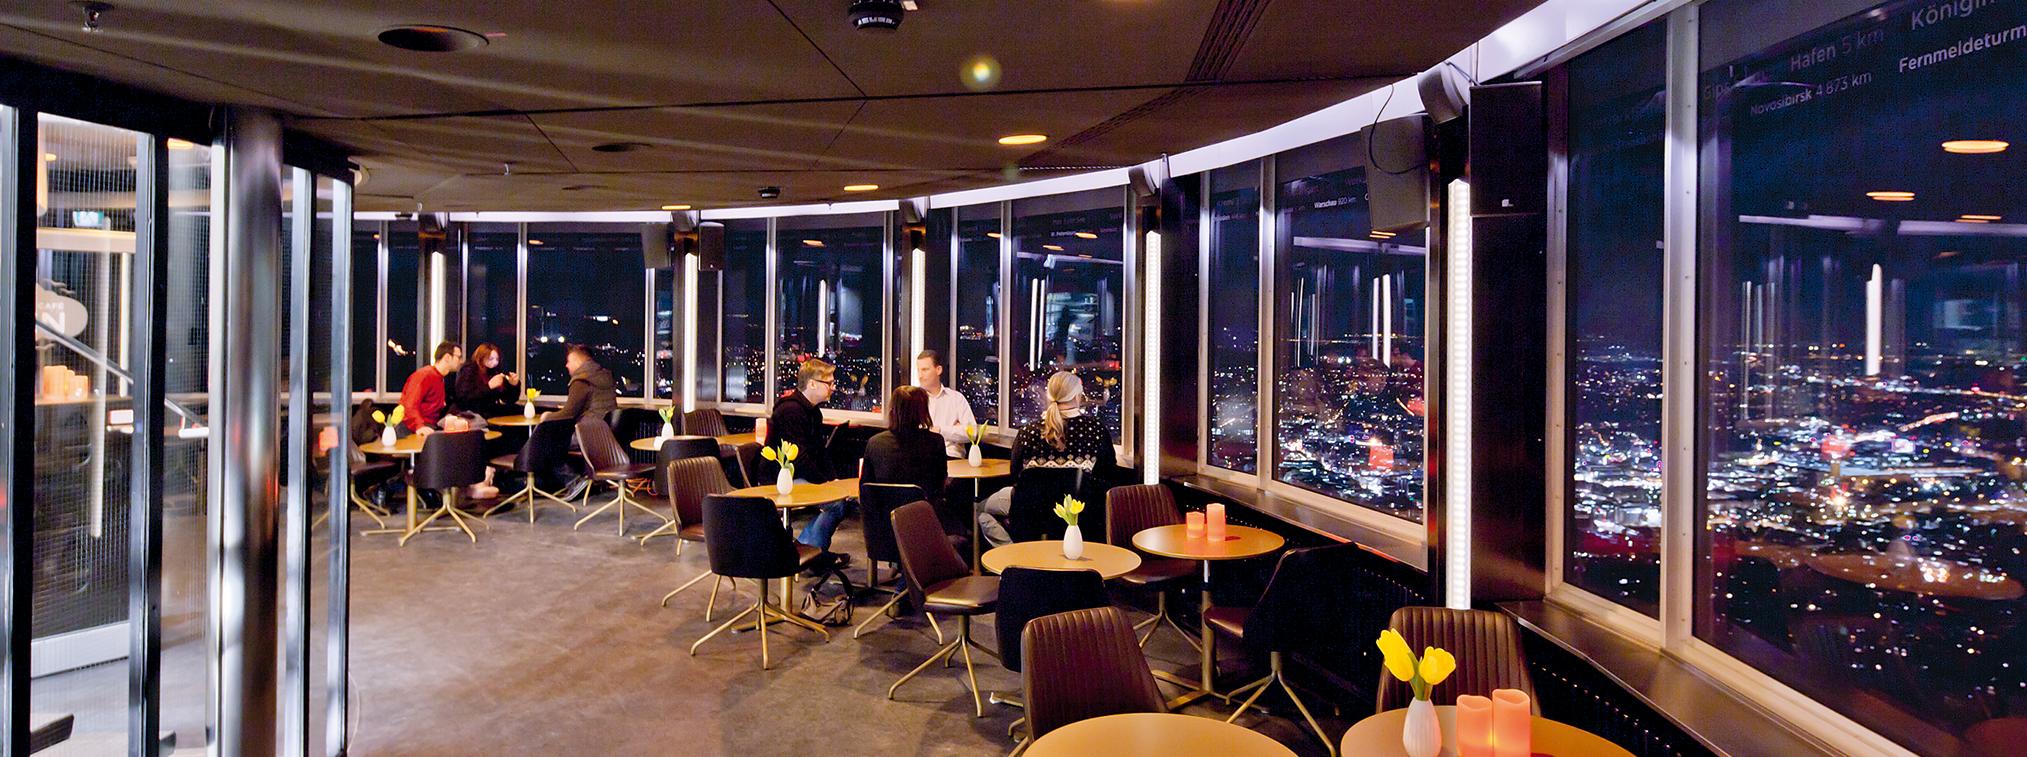 Speisekarte Panorama Cafe Fernsehturm